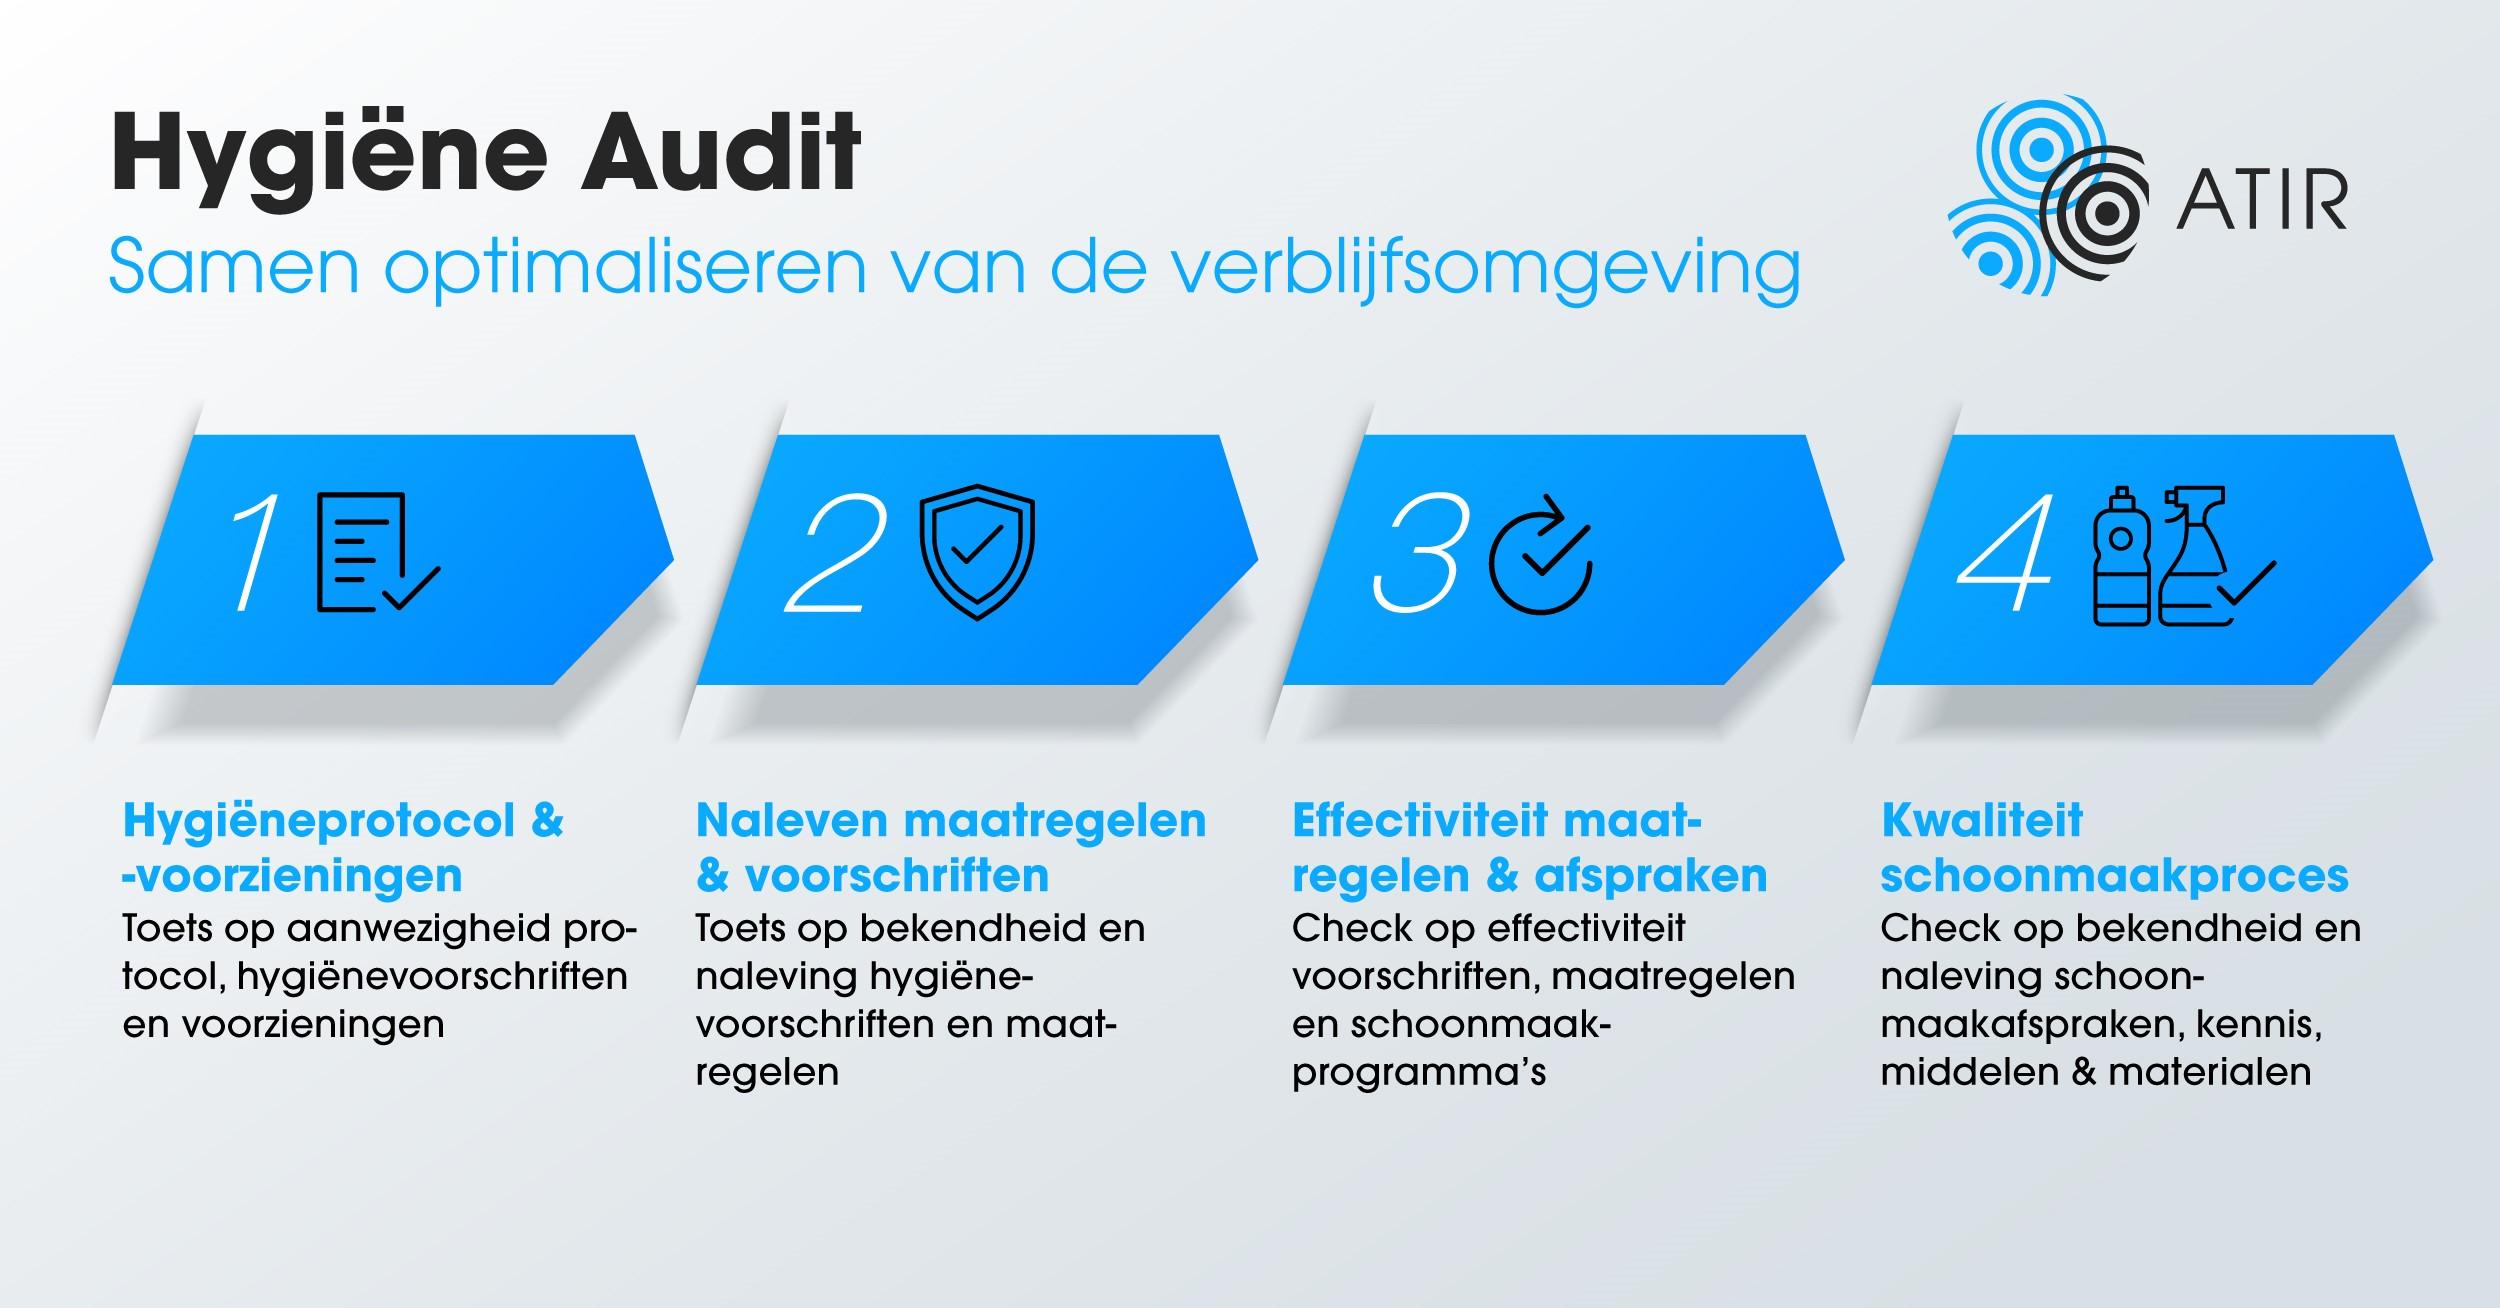 Hygiëne audit